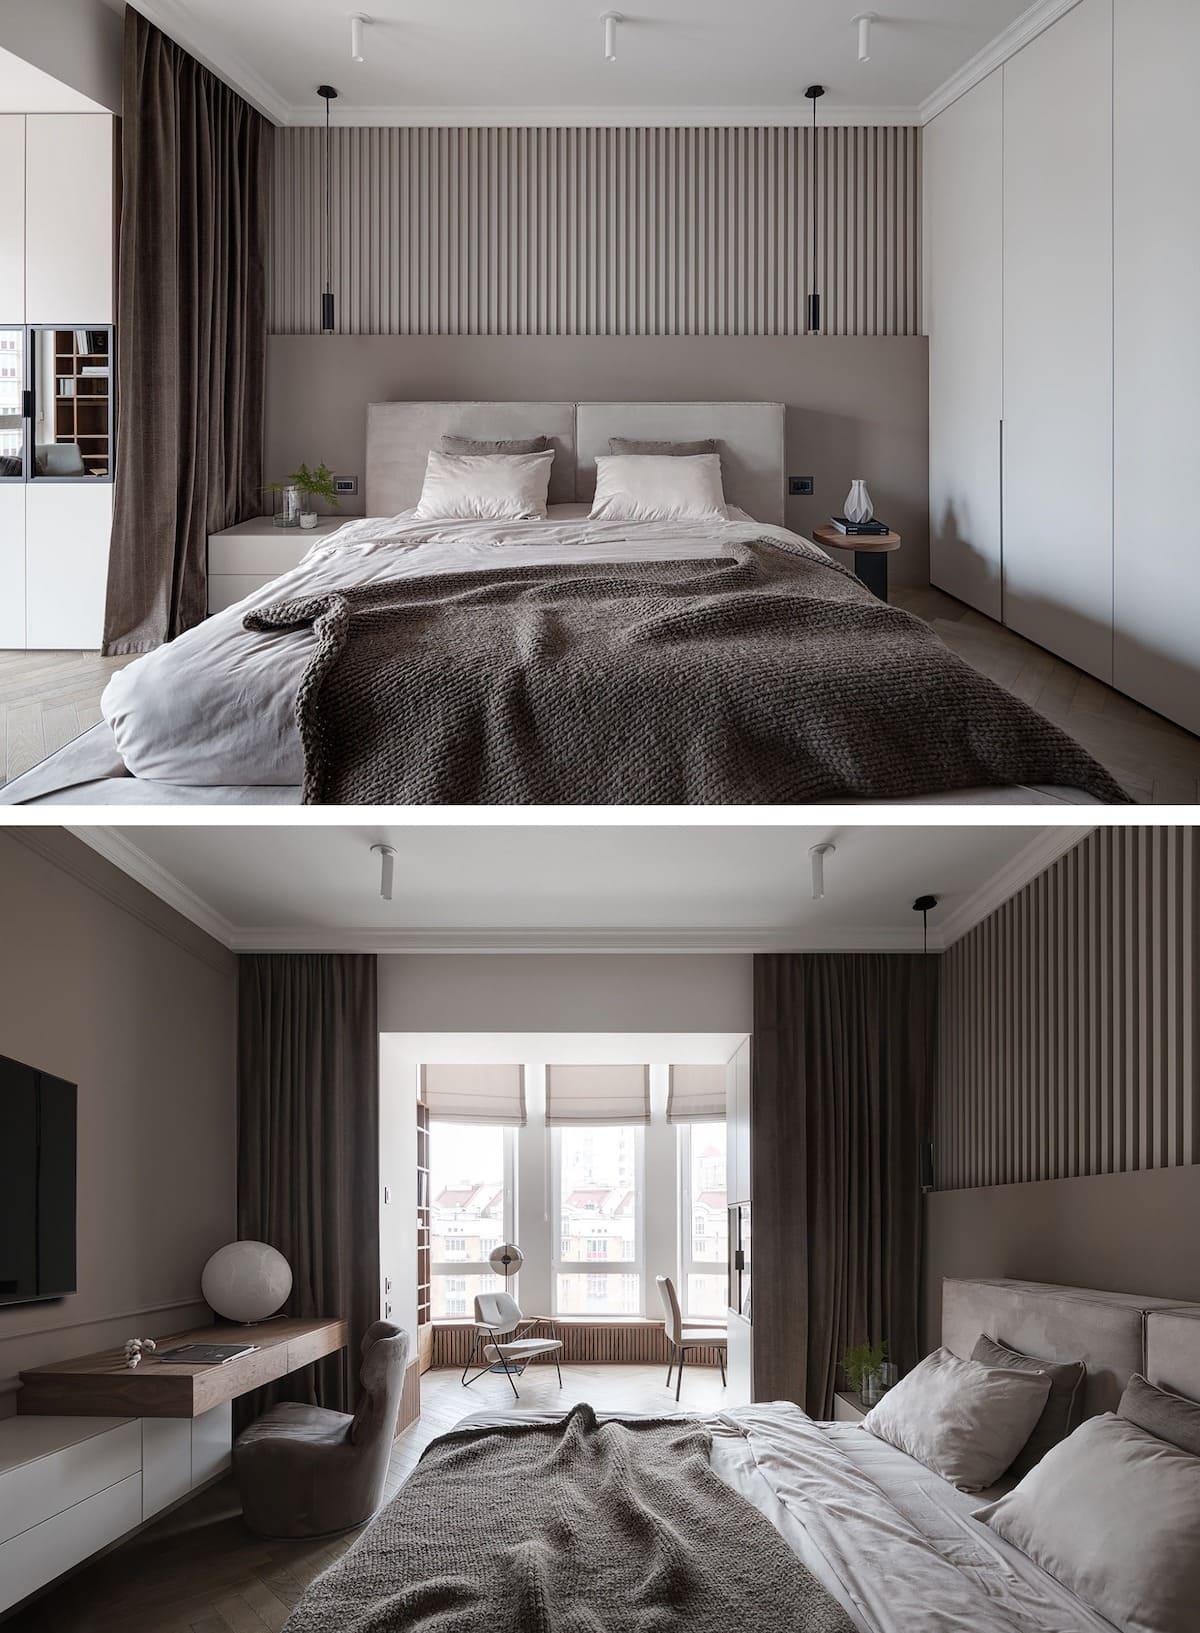 дизайн интерьера модной квартиры фото 55